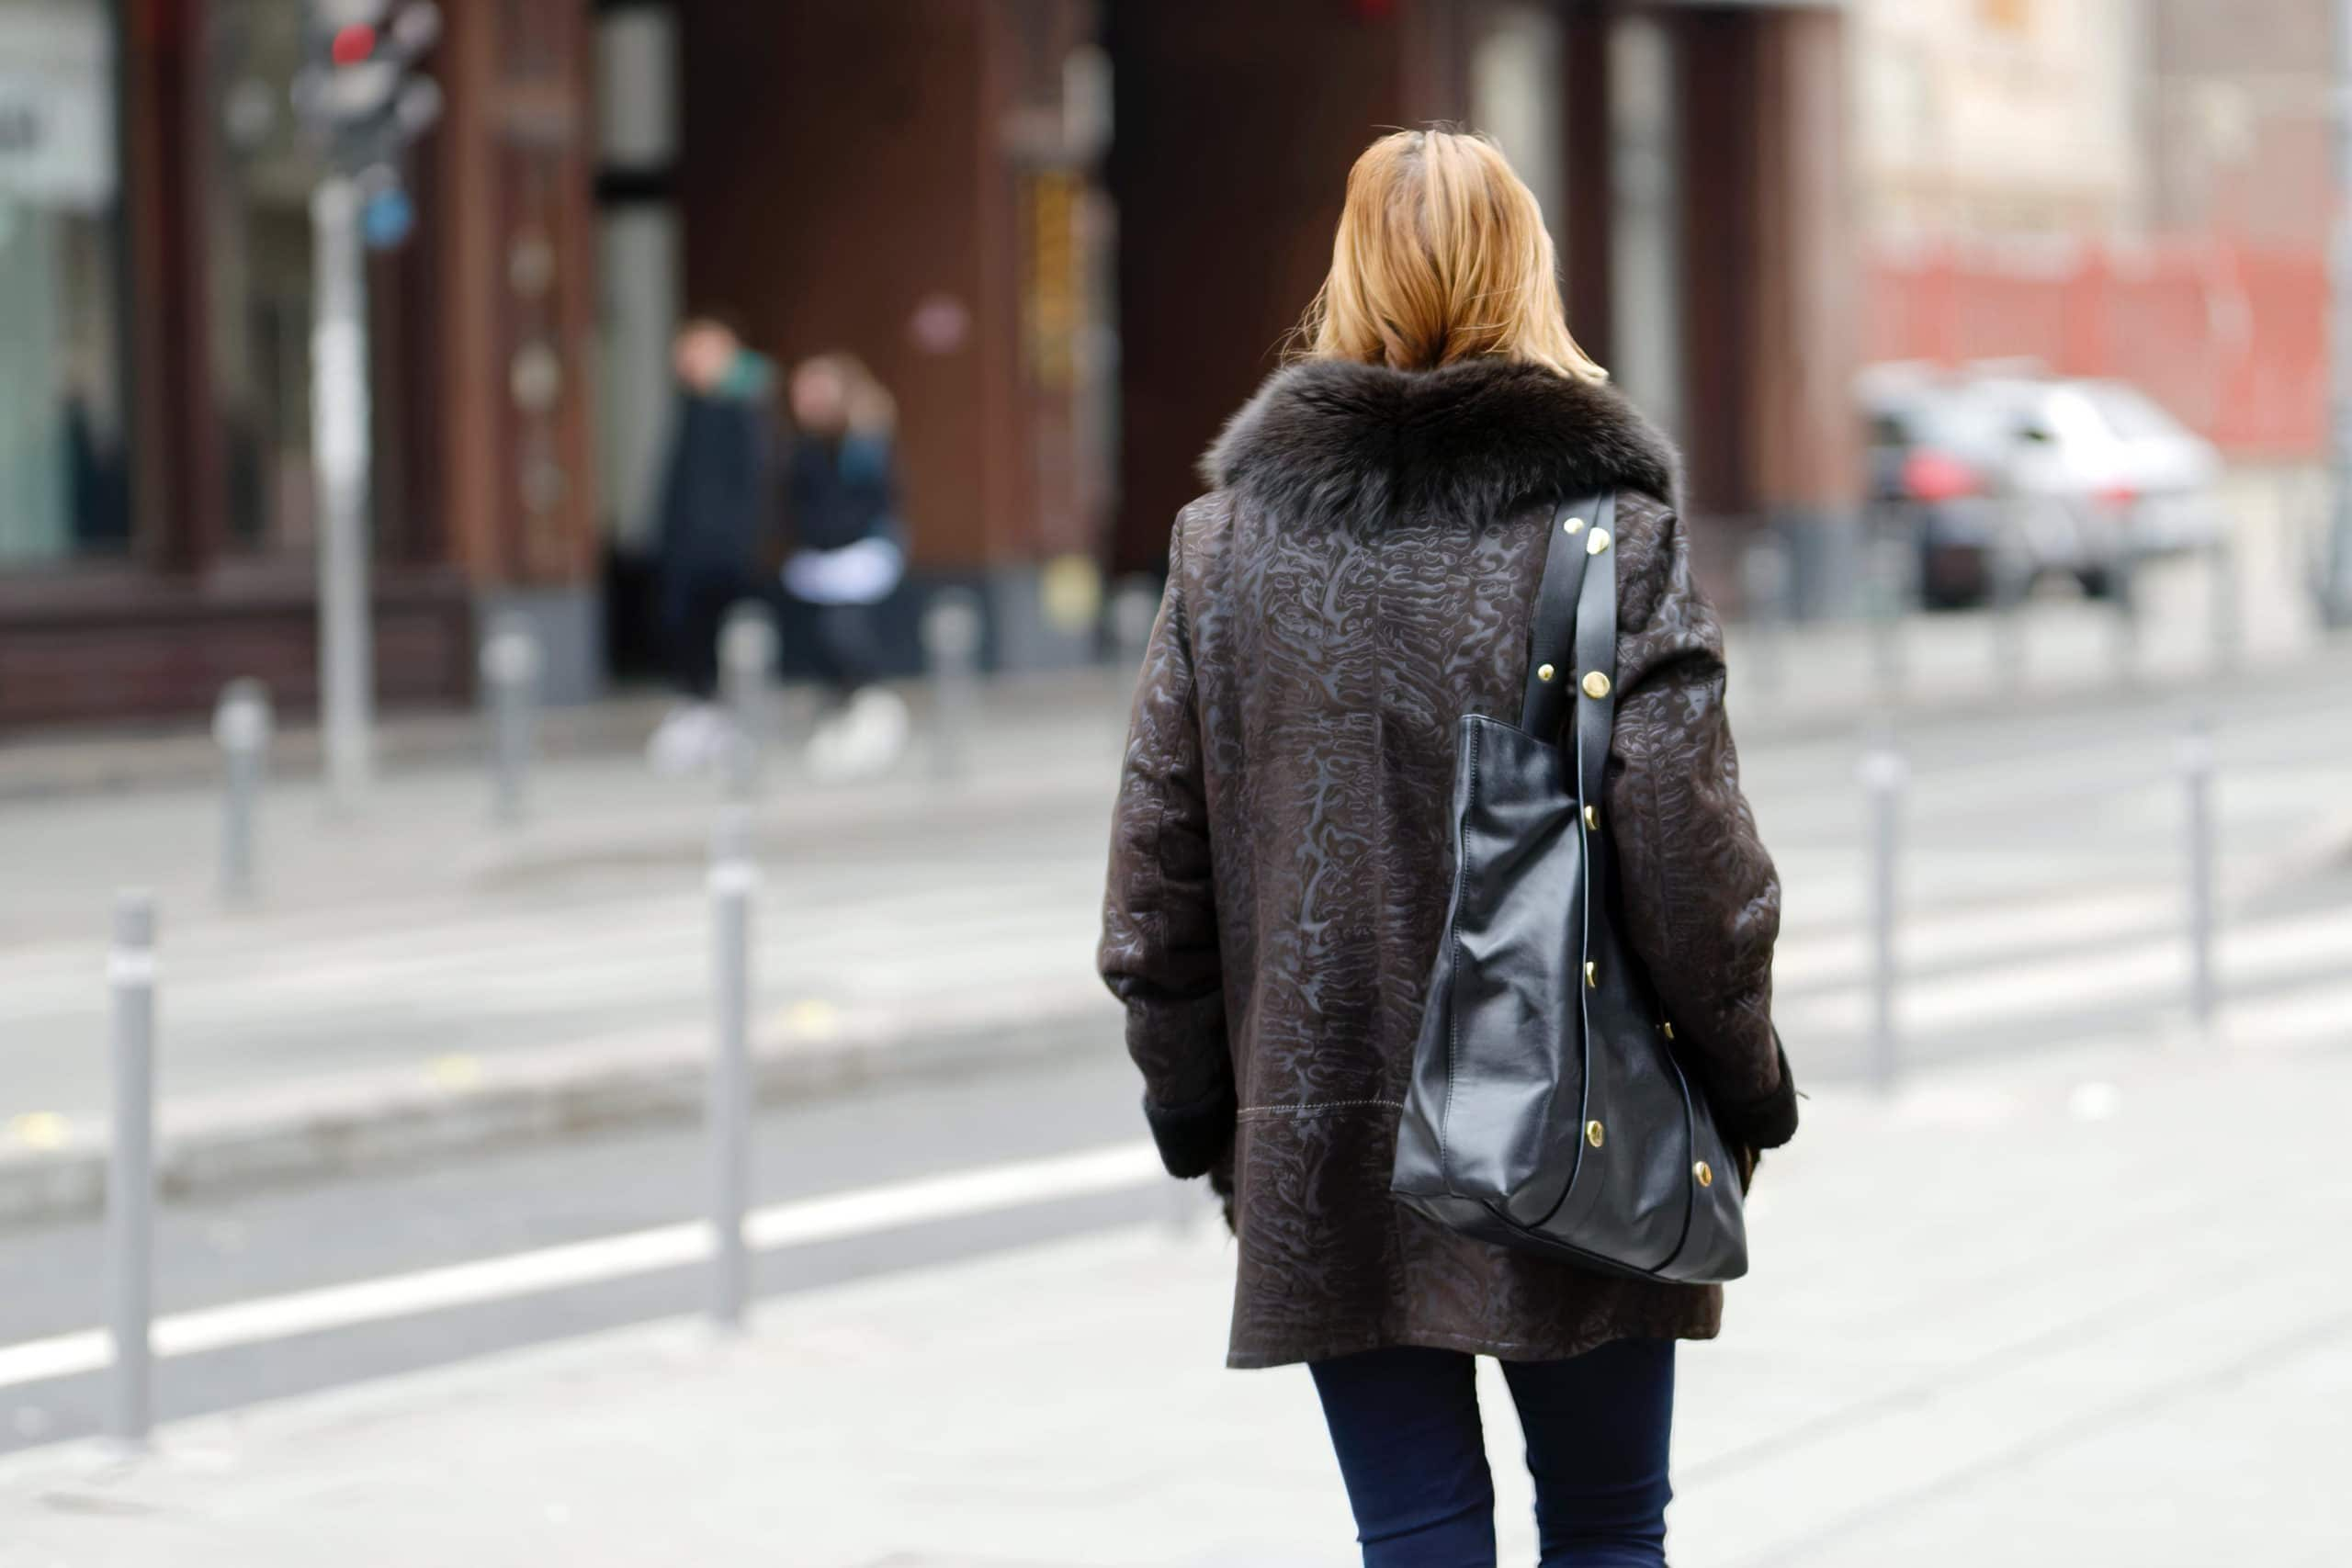 sac xxl tendances 2020